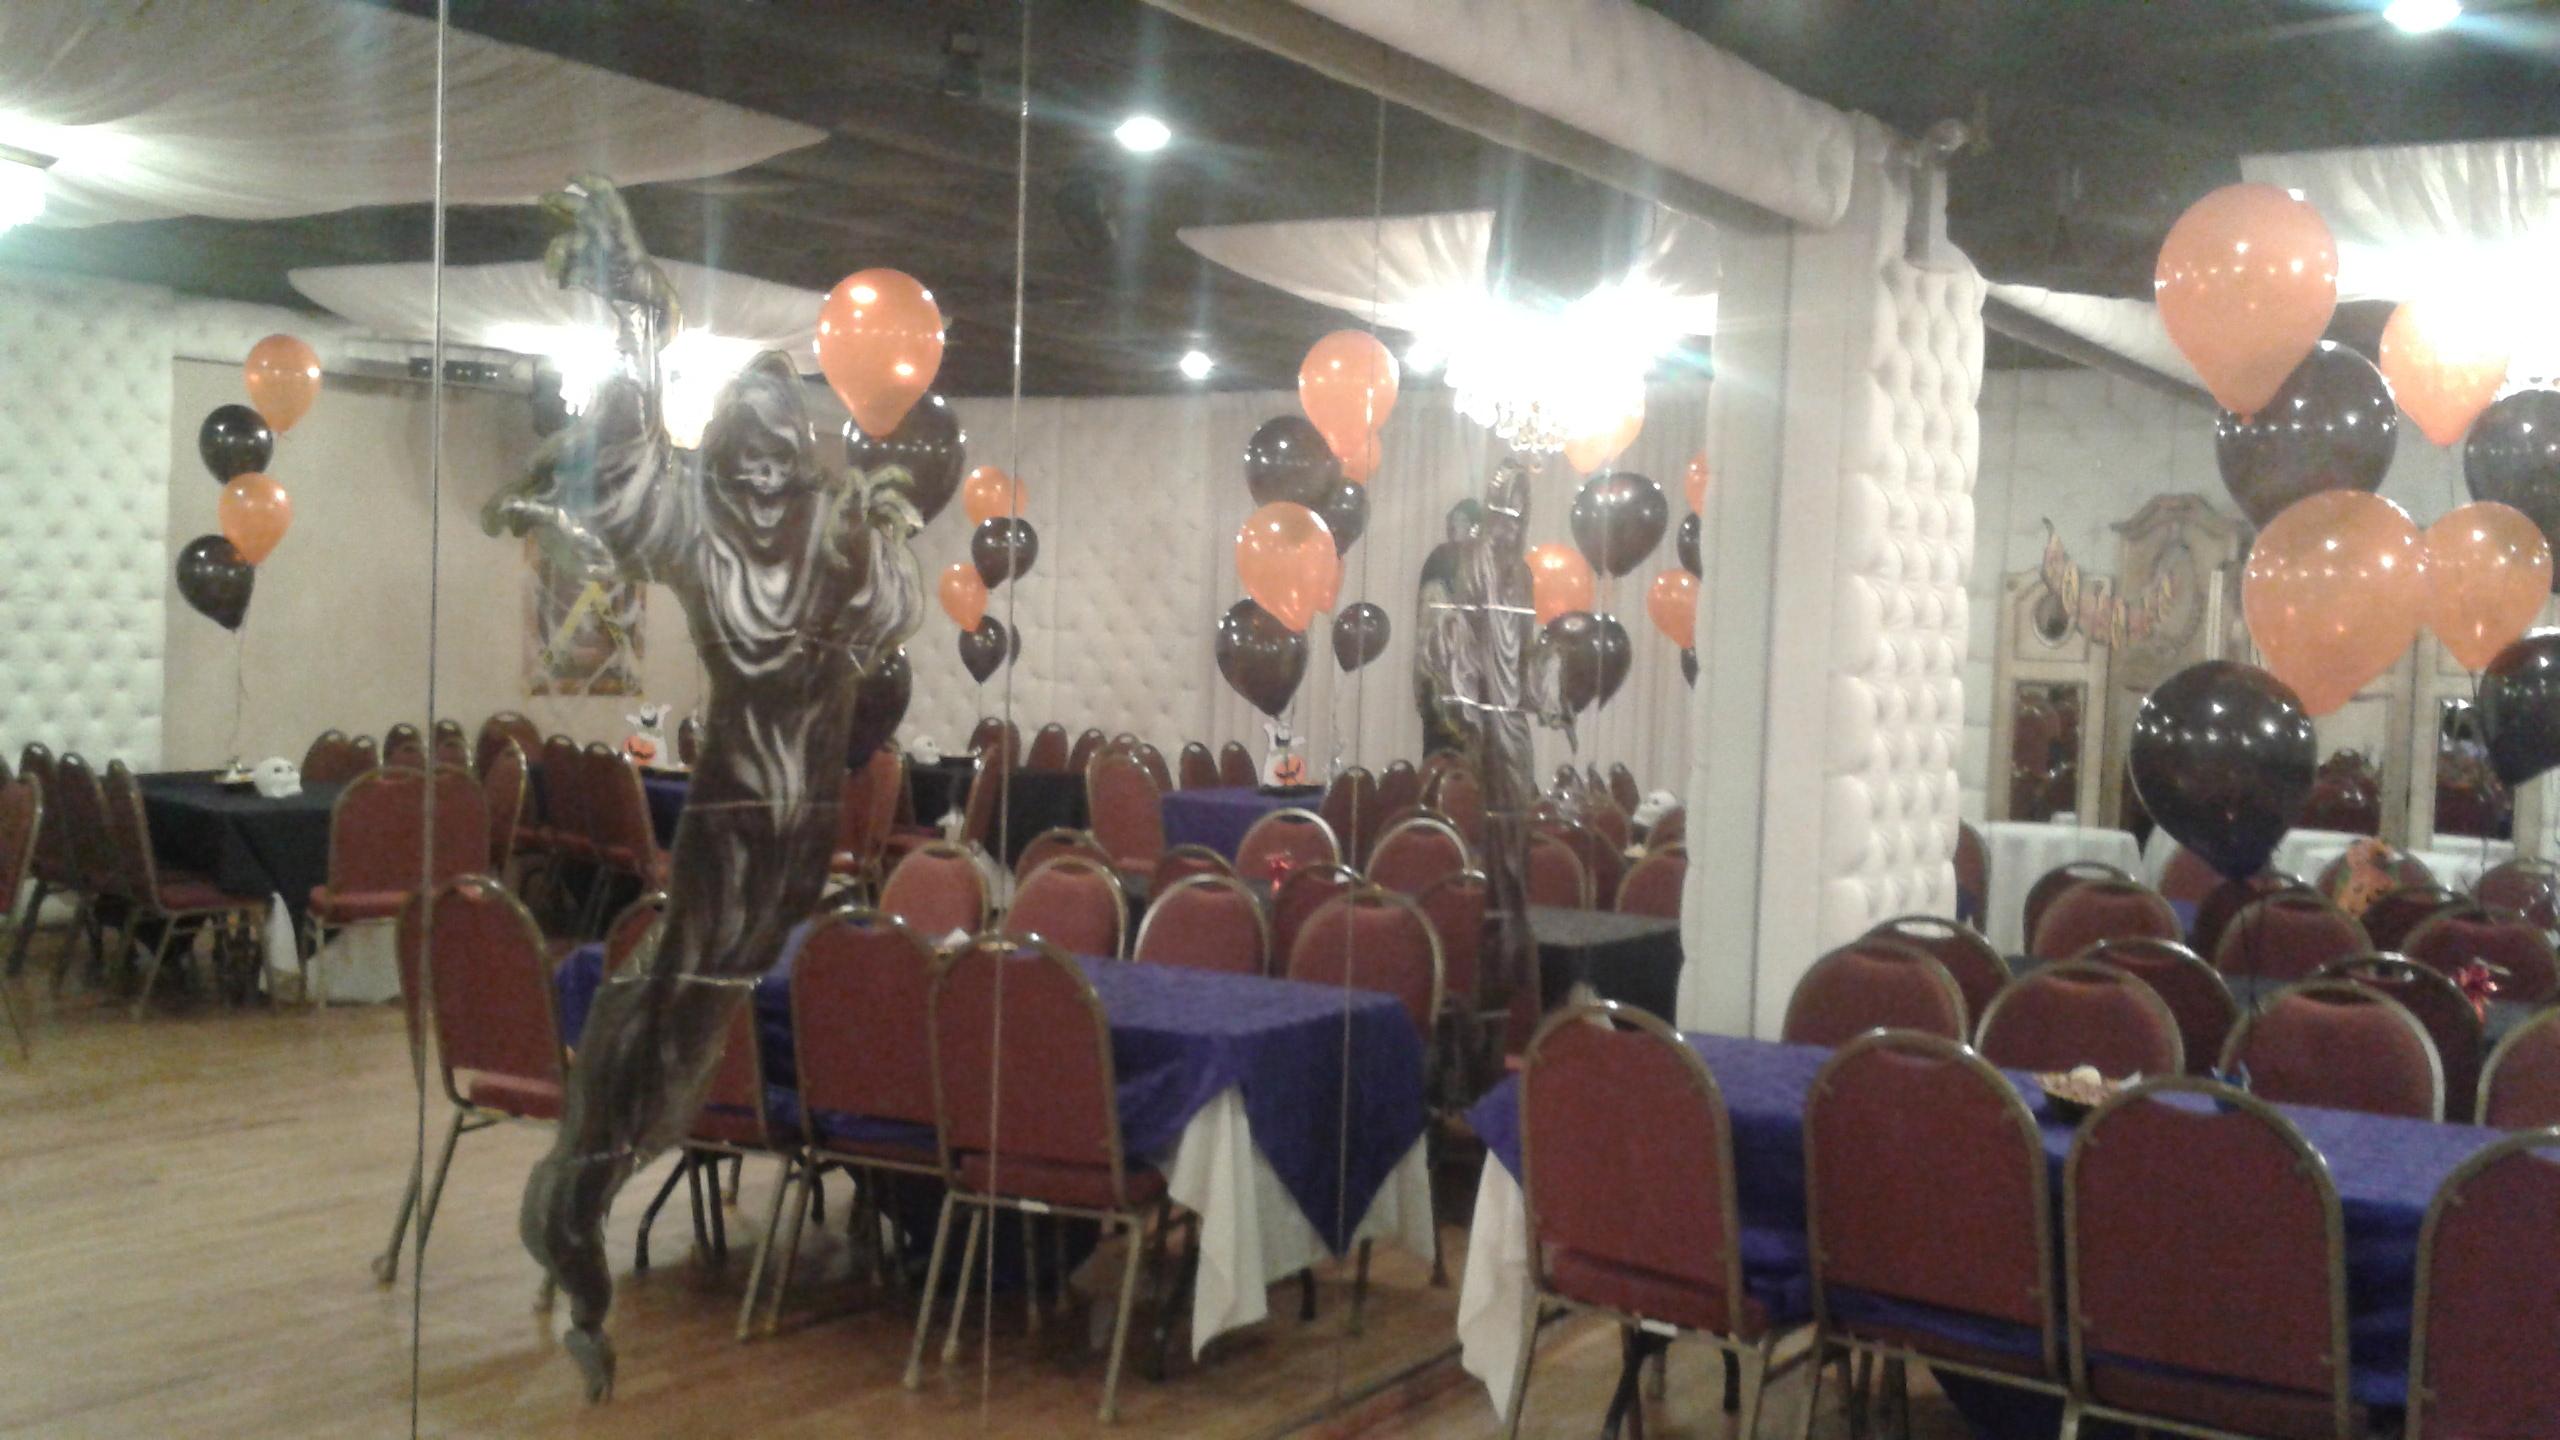 Dance Club International: Queens Catering Halls image 11